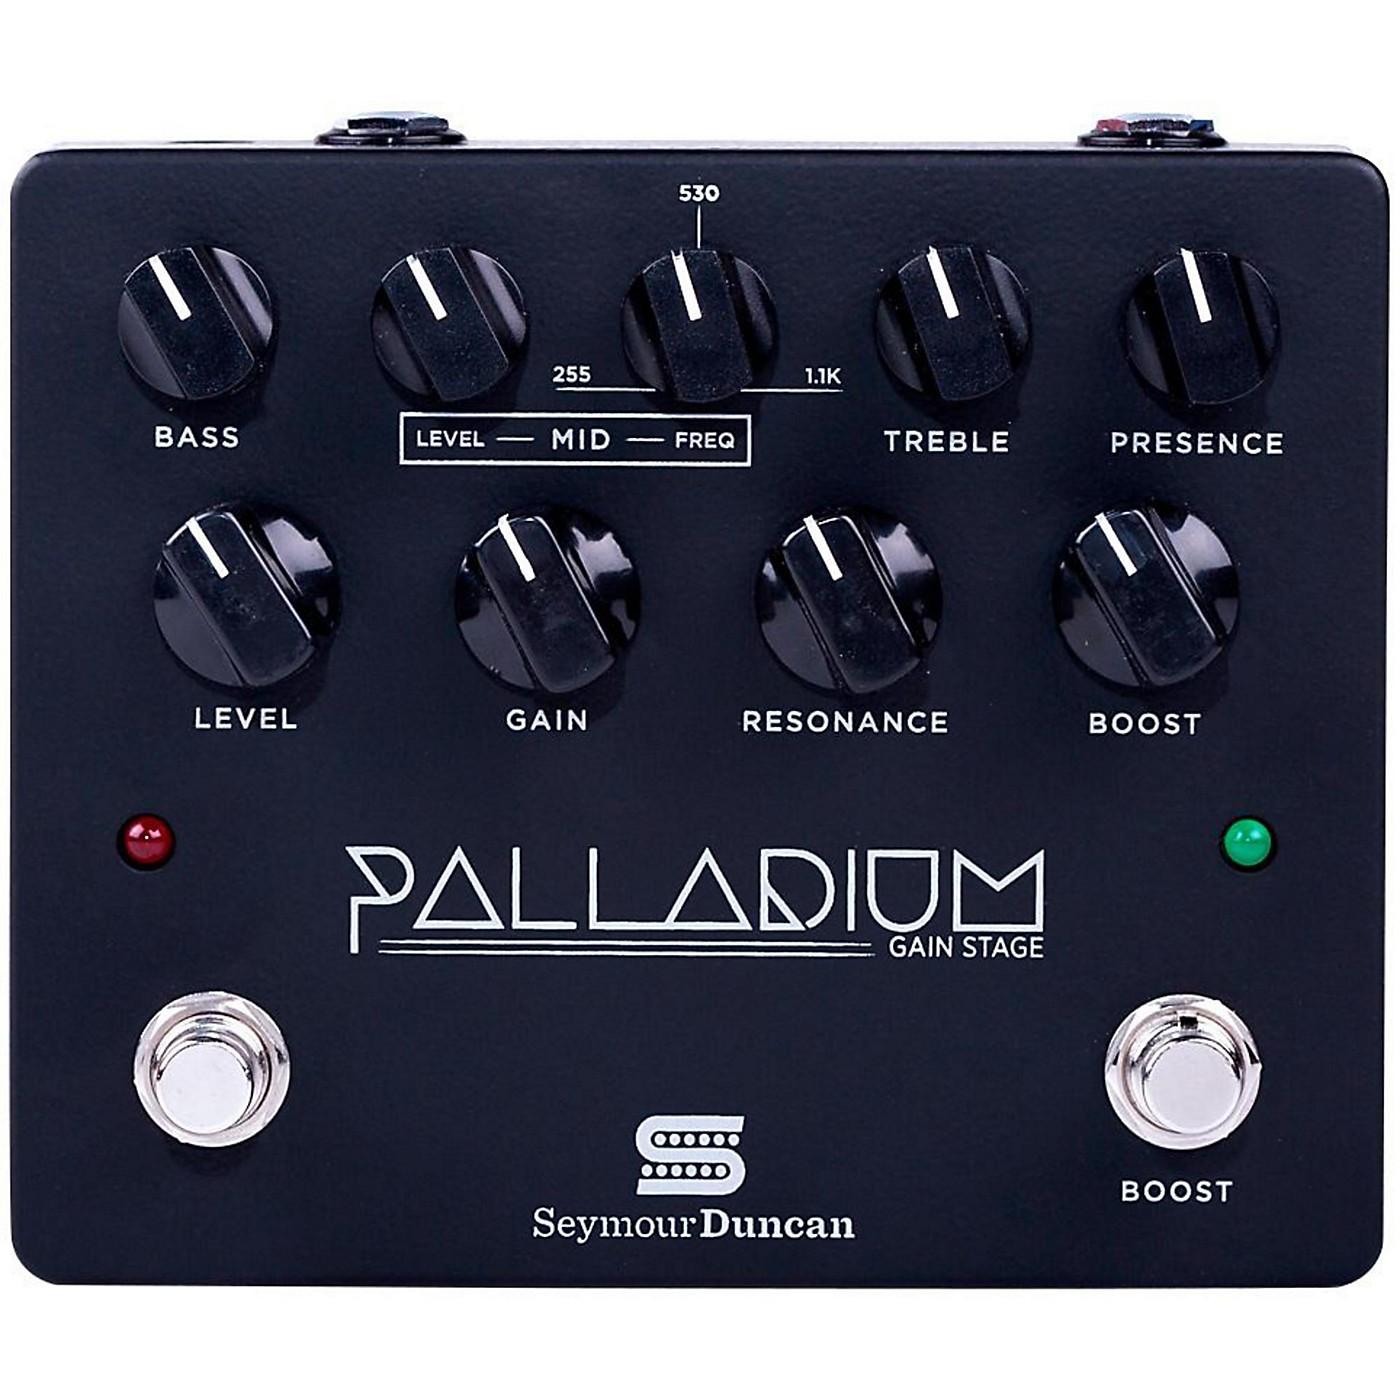 Seymour Duncan Palladium Gain Stage Distortion Guitar Effects  Pedal (Black) thumbnail